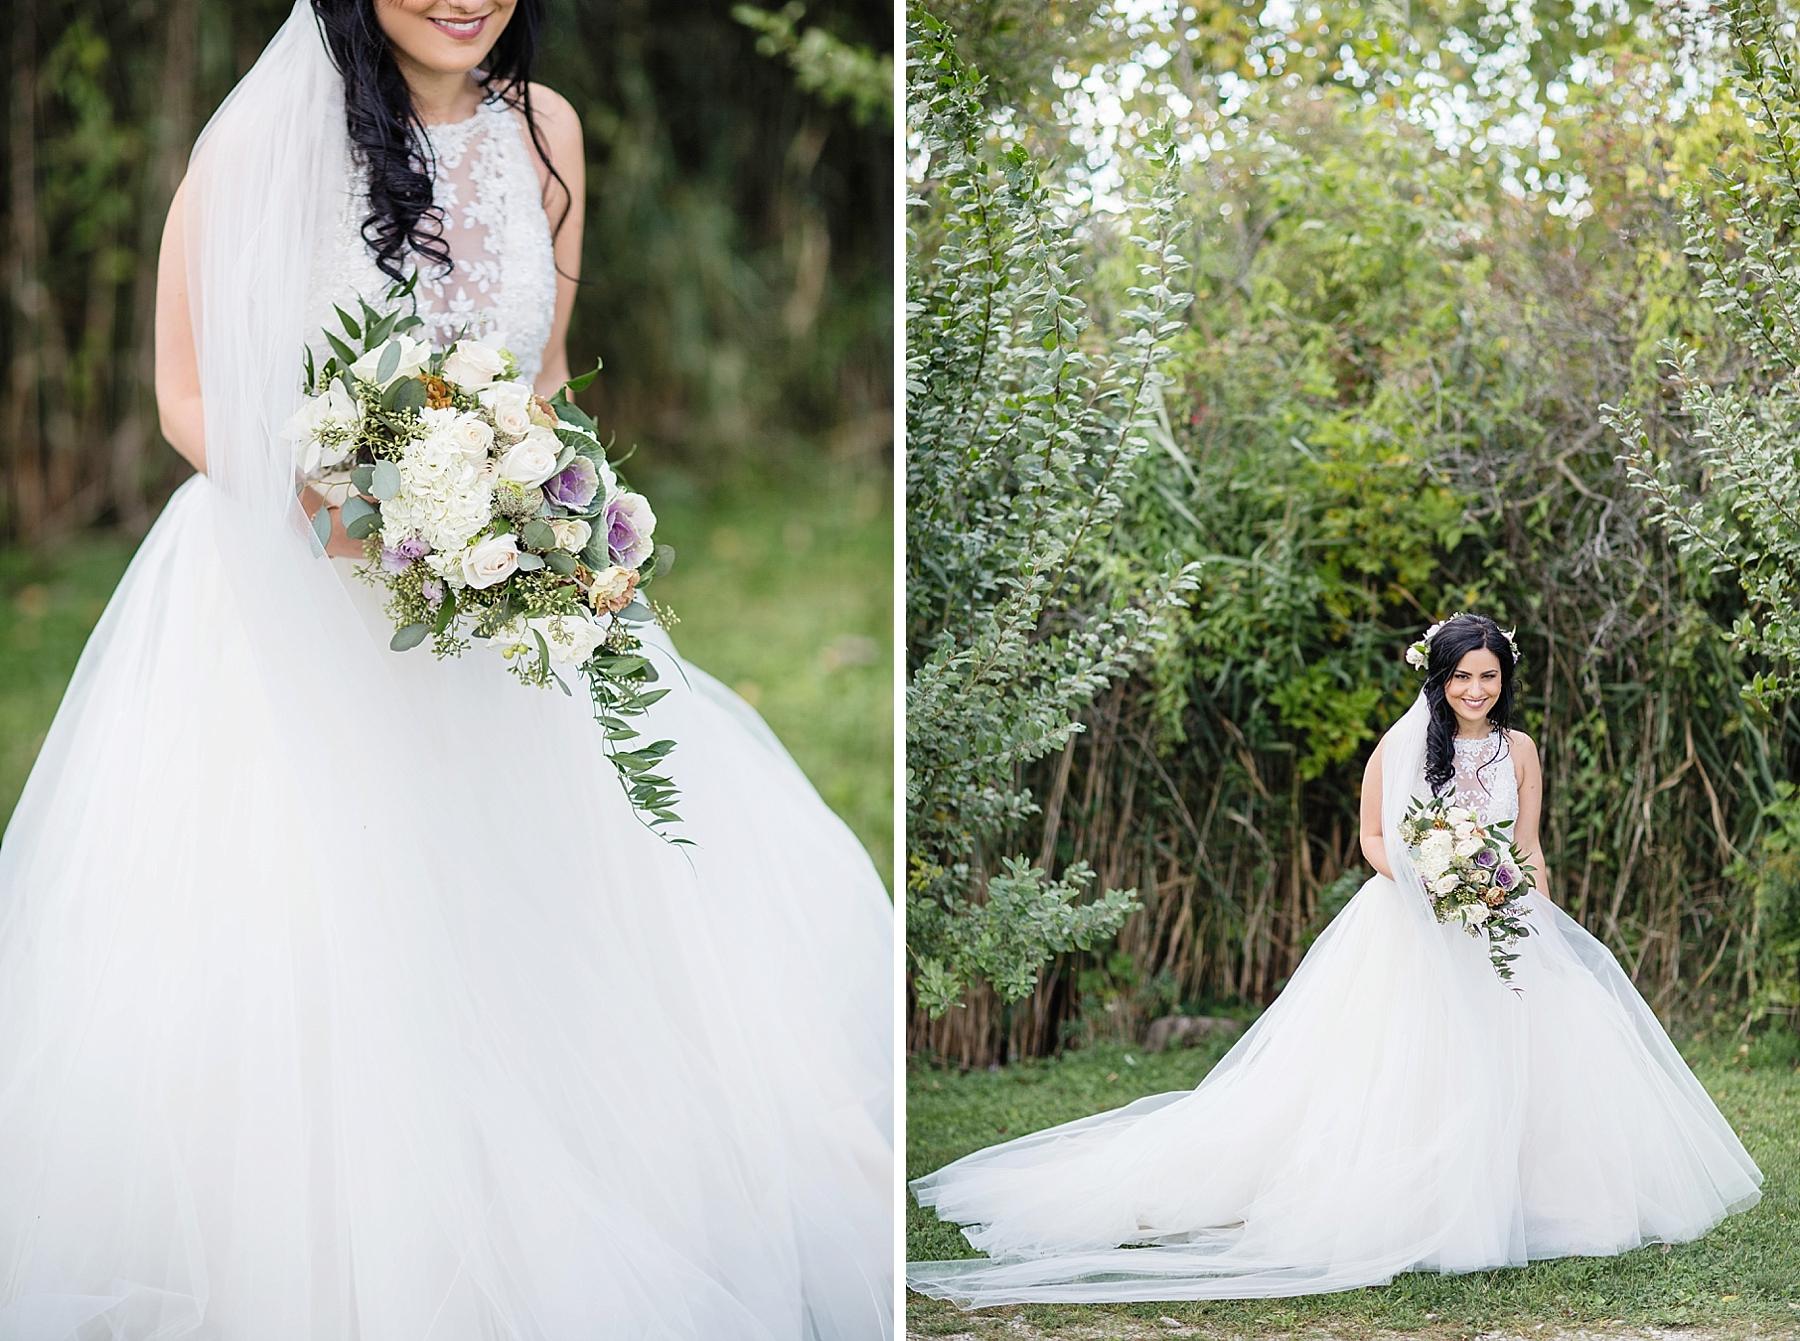 windsor-wedding-photographer-sprucewood-shores-winery-wedding-niagara-on-the-lake-wedding-photographer-eryn-shea-photography_0037.jpg